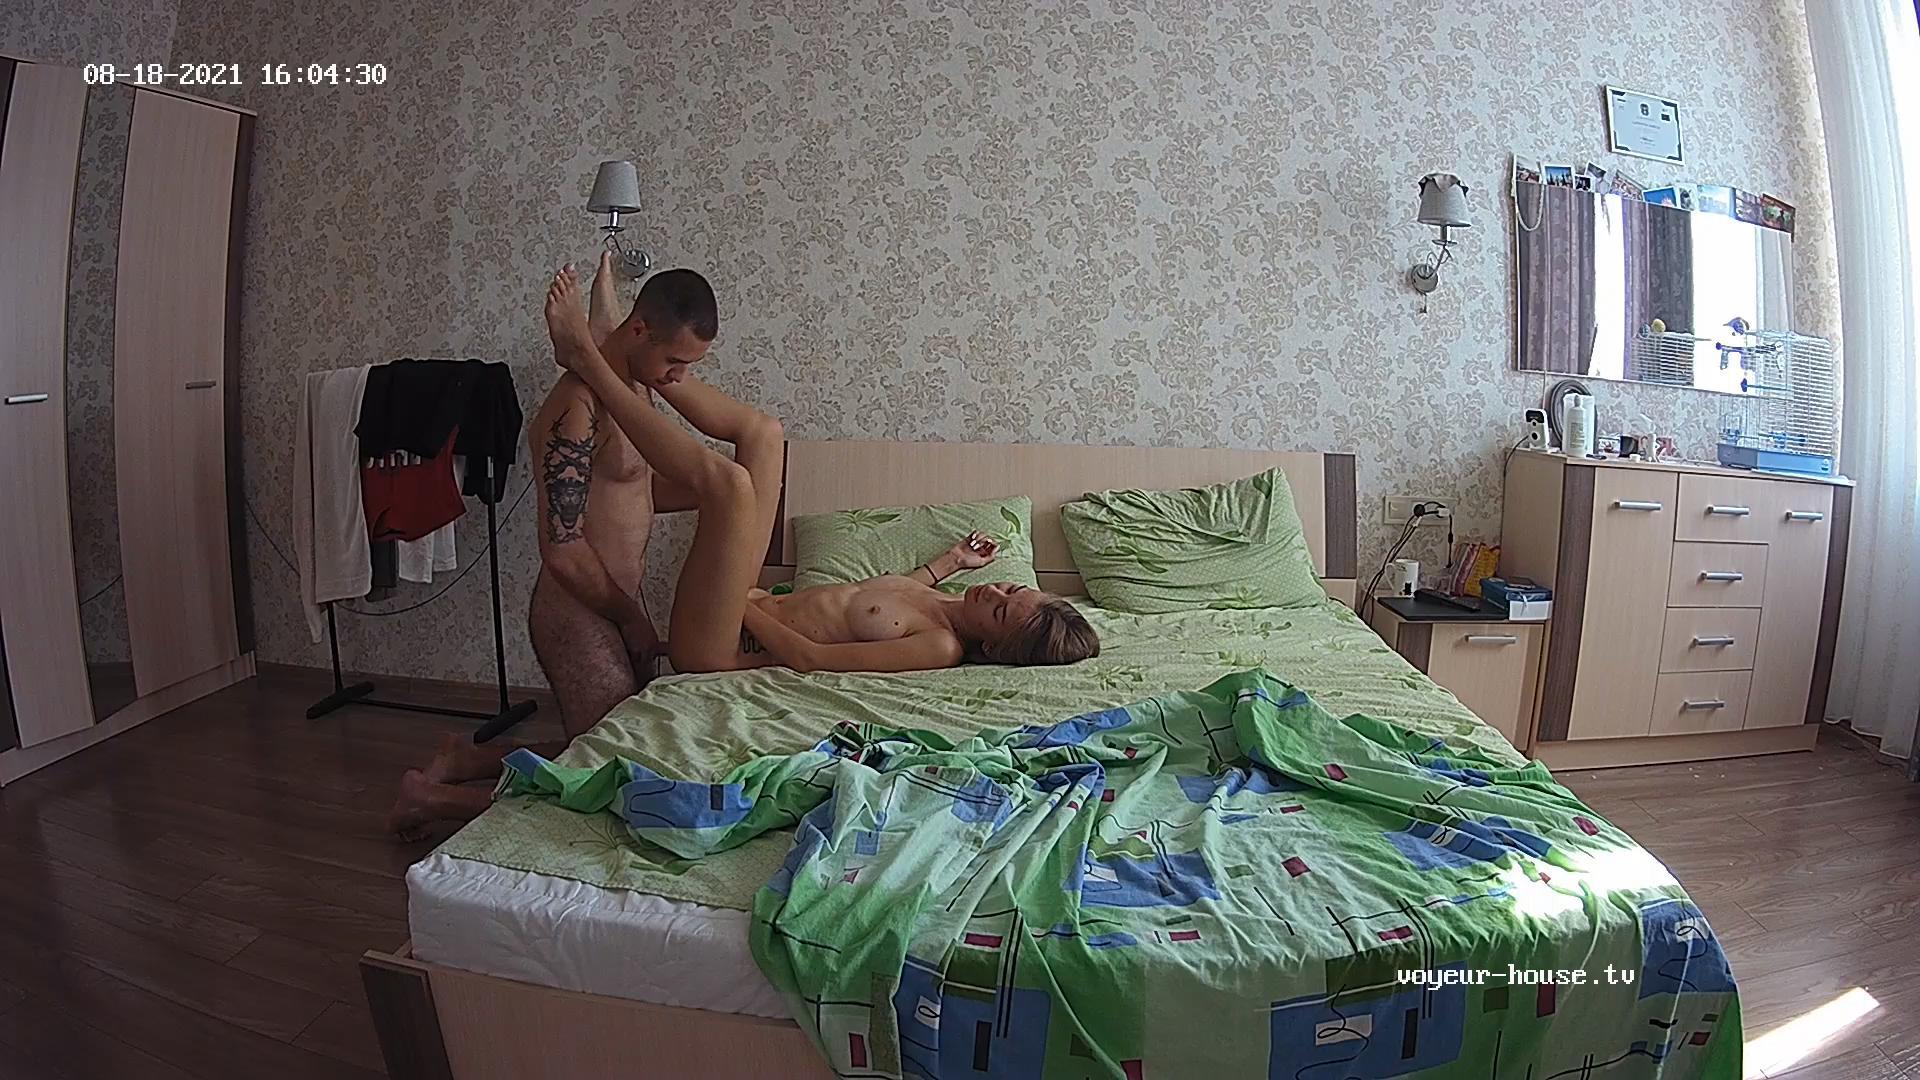 Amelie Lucas afternoon sex Aug 18 2021 cam 2